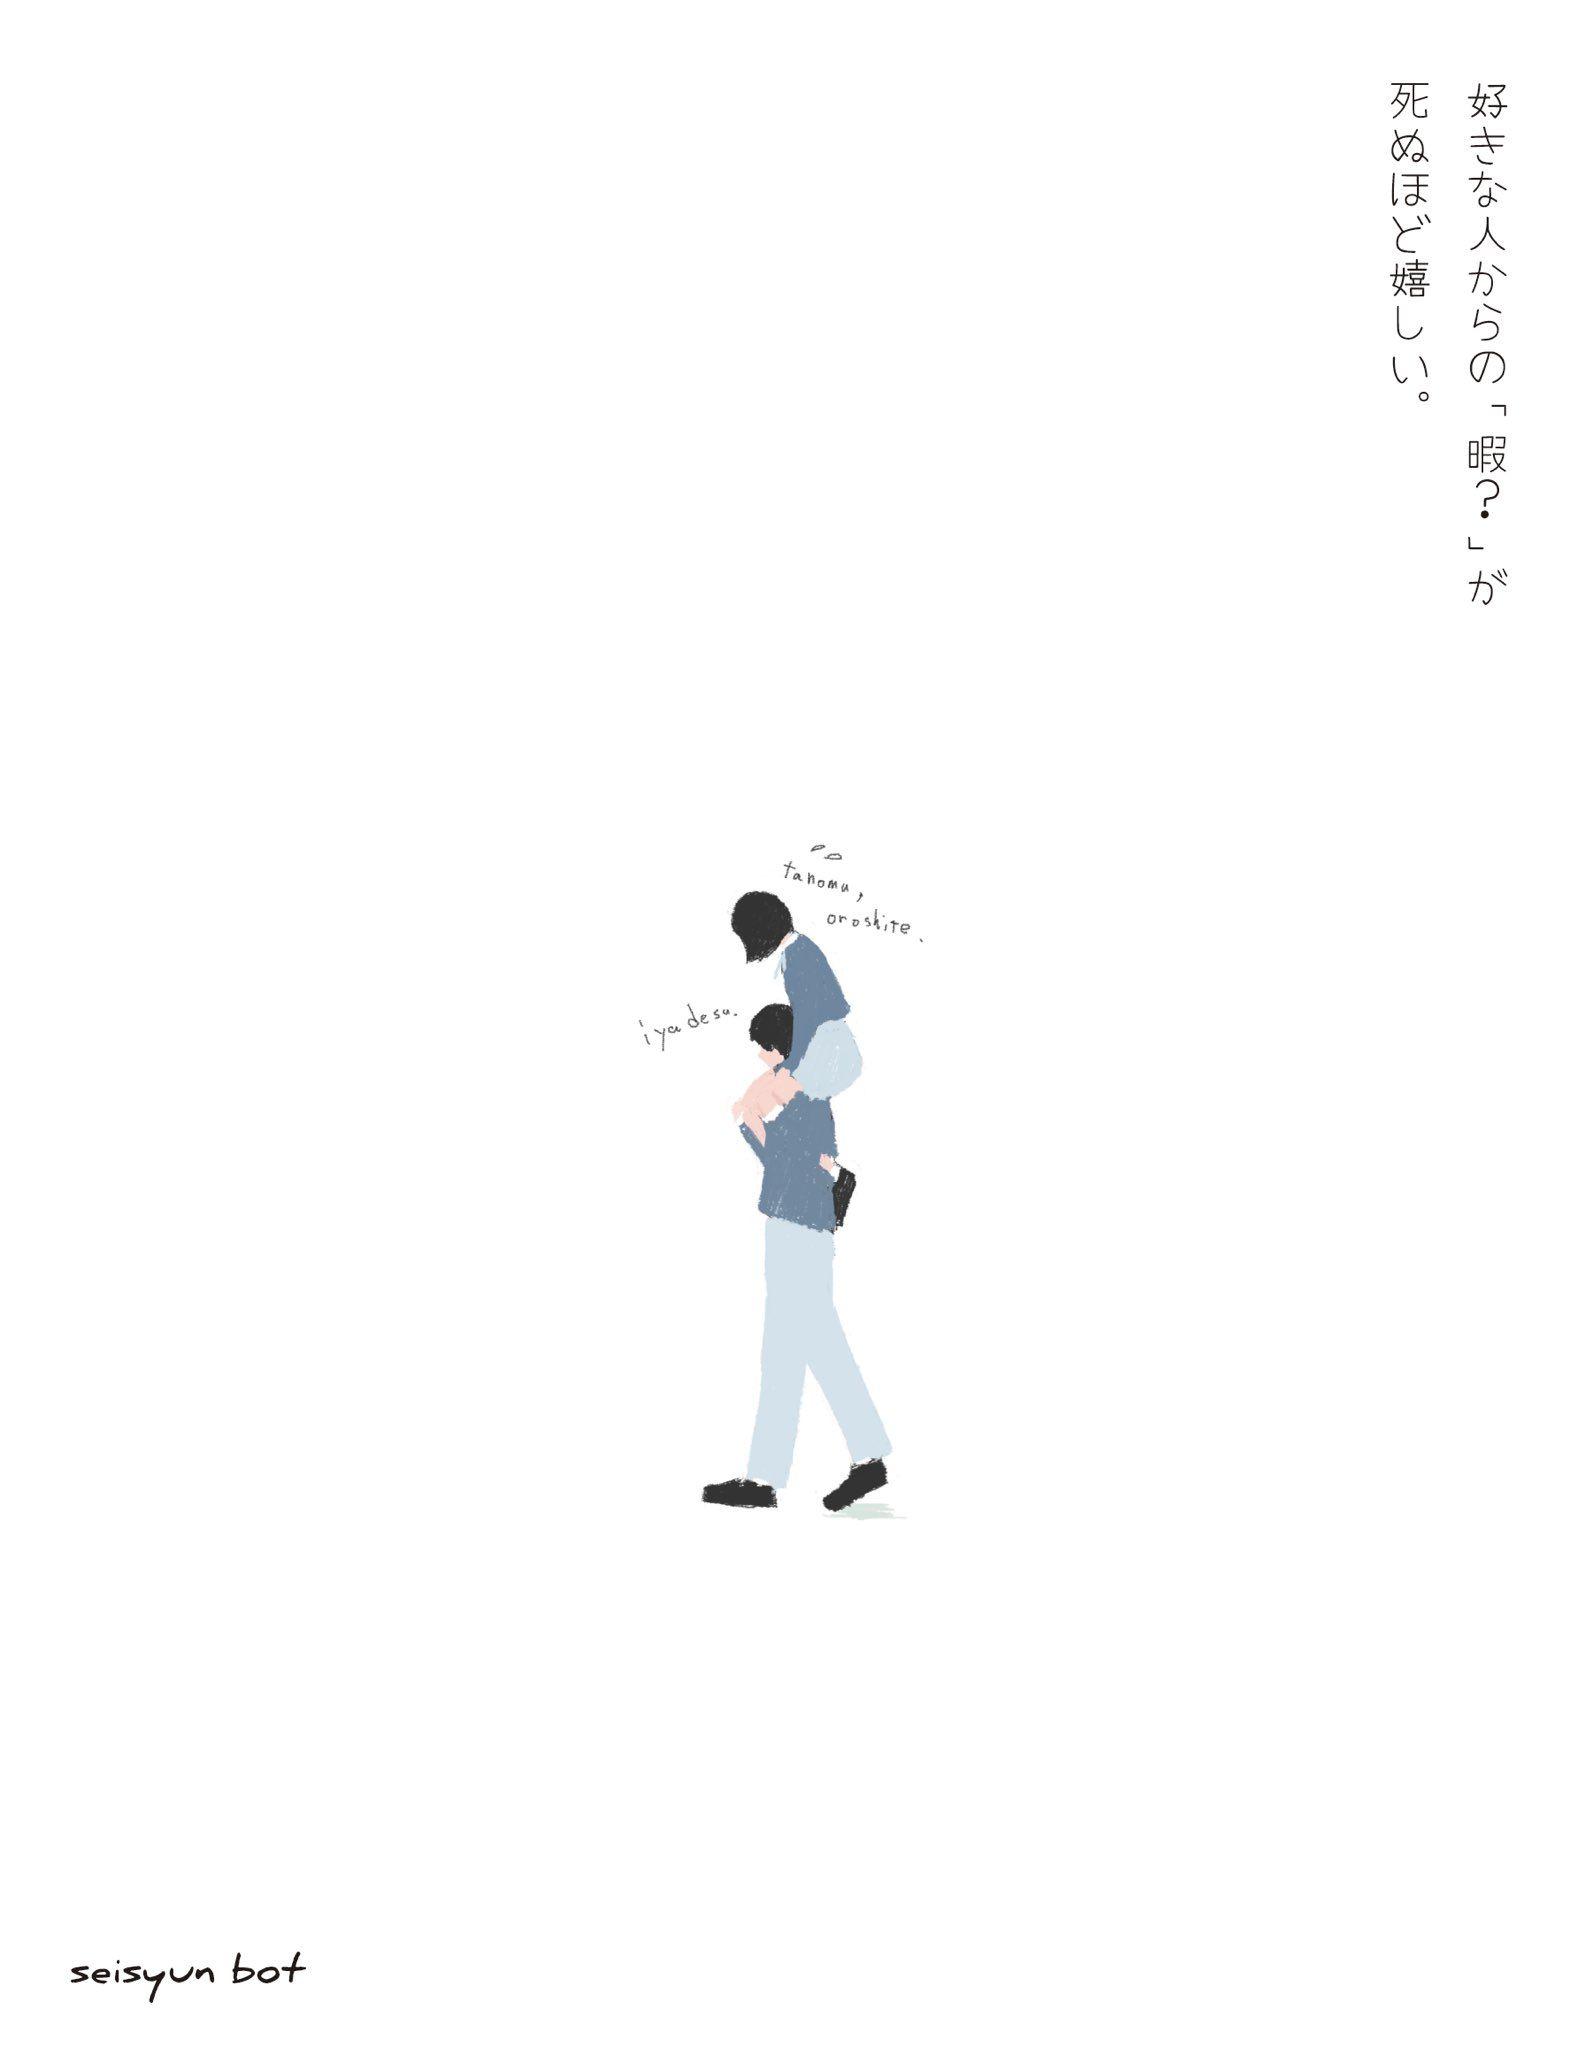 Twitter 2020 漫画の壁紙 ジブリ イラスト かわいい ジブリ イラスト